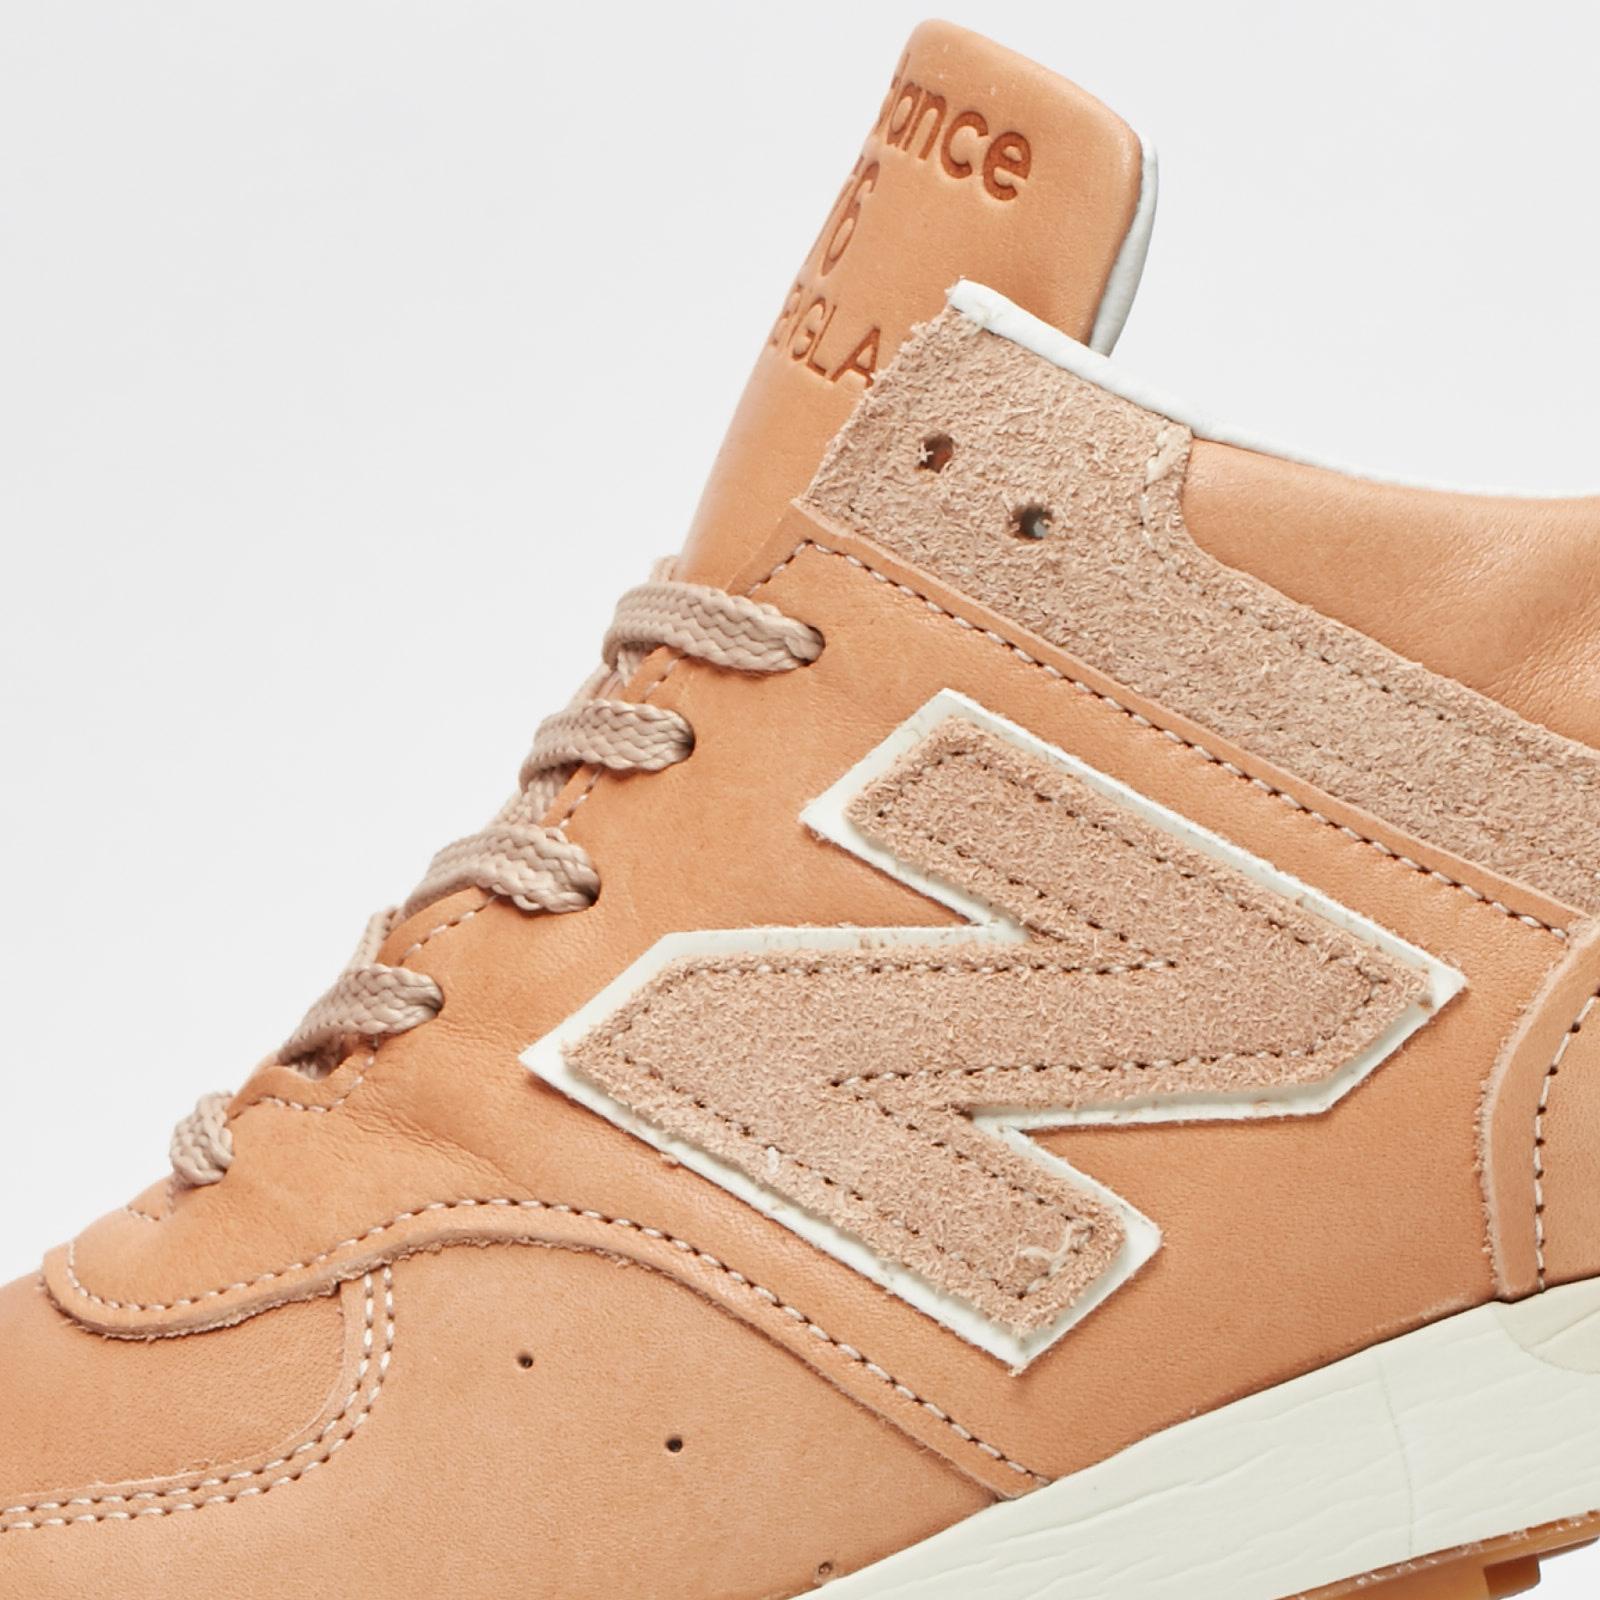 new product 5b71d 9f89c New Balance M576 - M576vt - Sneakersnstuff | sneakers ...